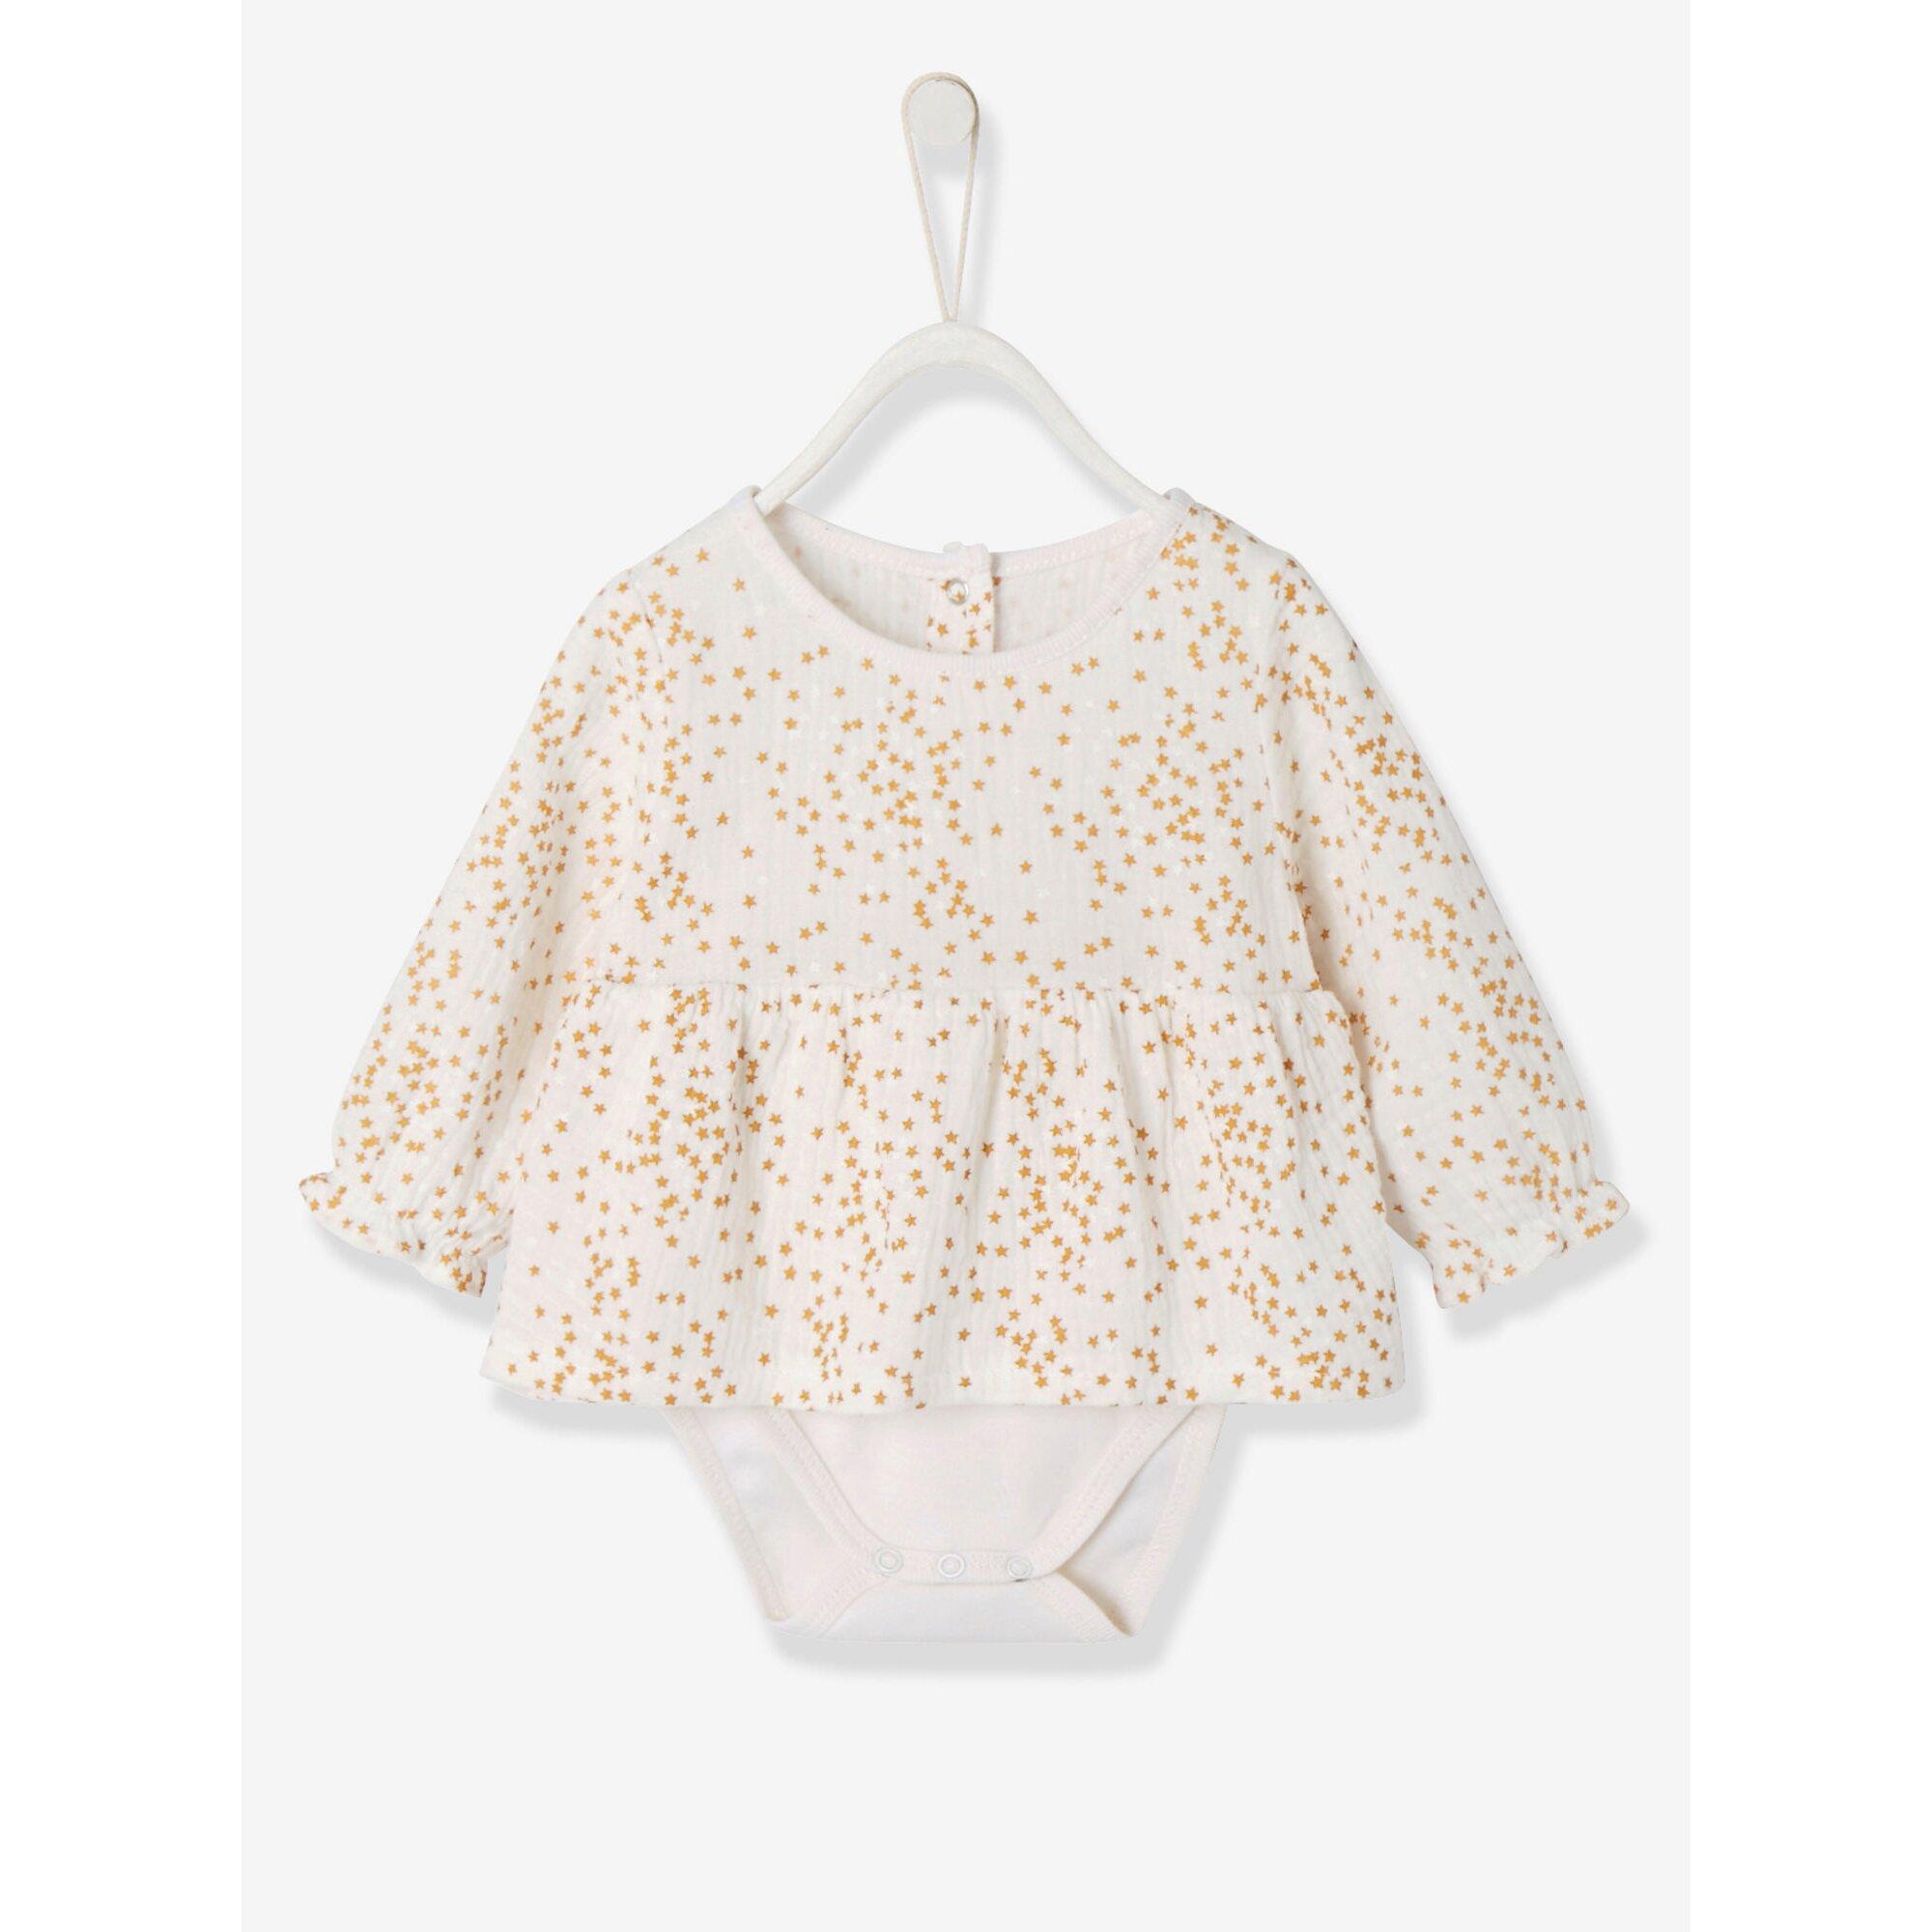 vertbaudet-baby-shirtbody-leggings-und-weste, 35.99 EUR @ babywalz-de